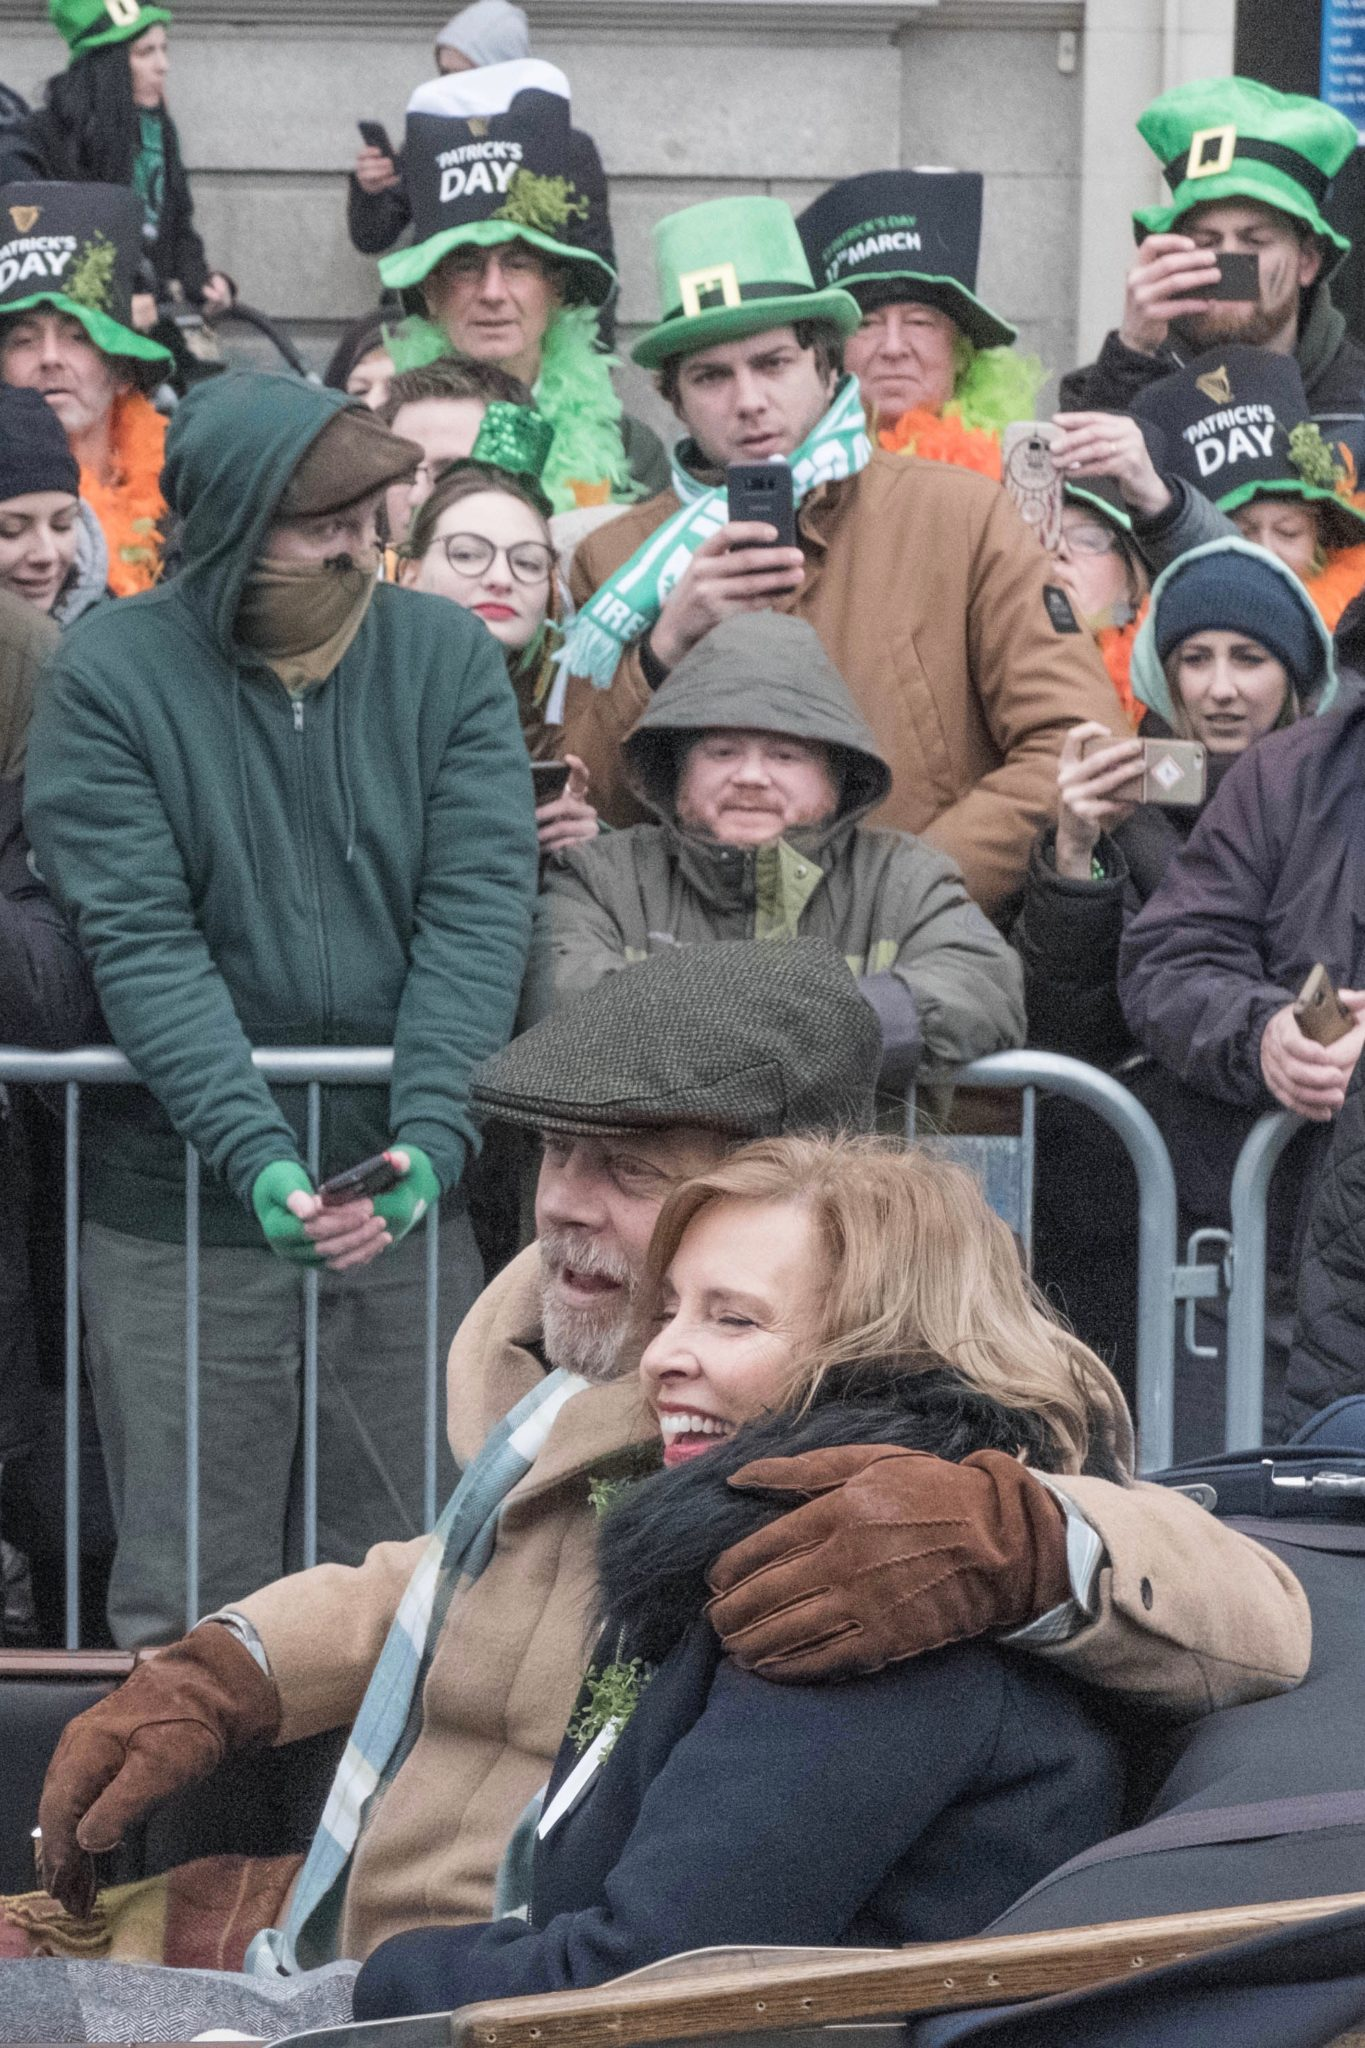 St. Patrick's Day in Dublin: Mark Hammill in Dublin